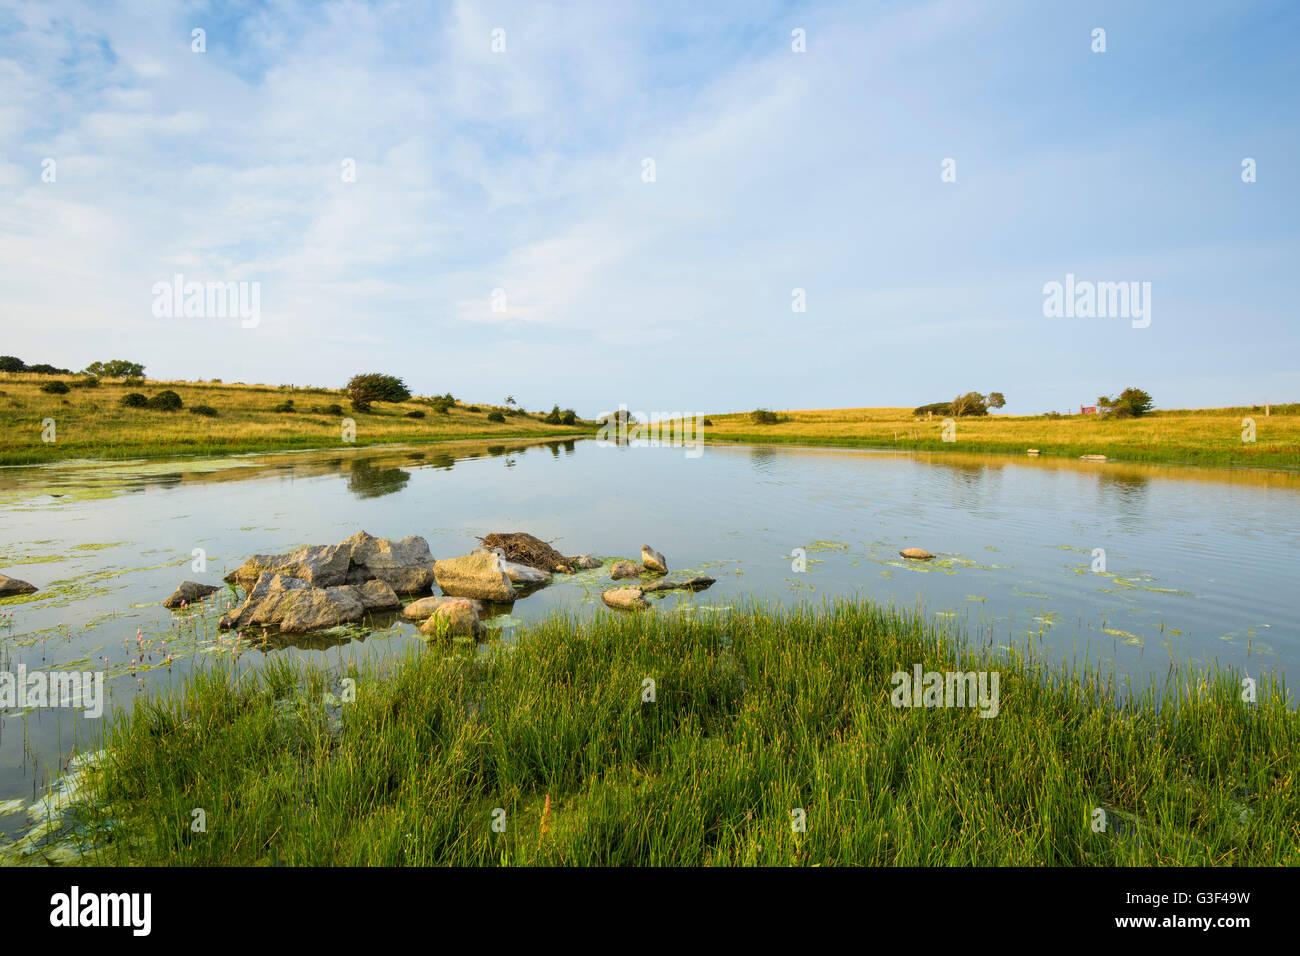 Inland Lake in Summer, Fyns Hoved, Hindsholm, Kerteminde, Funen, Baltic Sea, Denmark - Stock Image